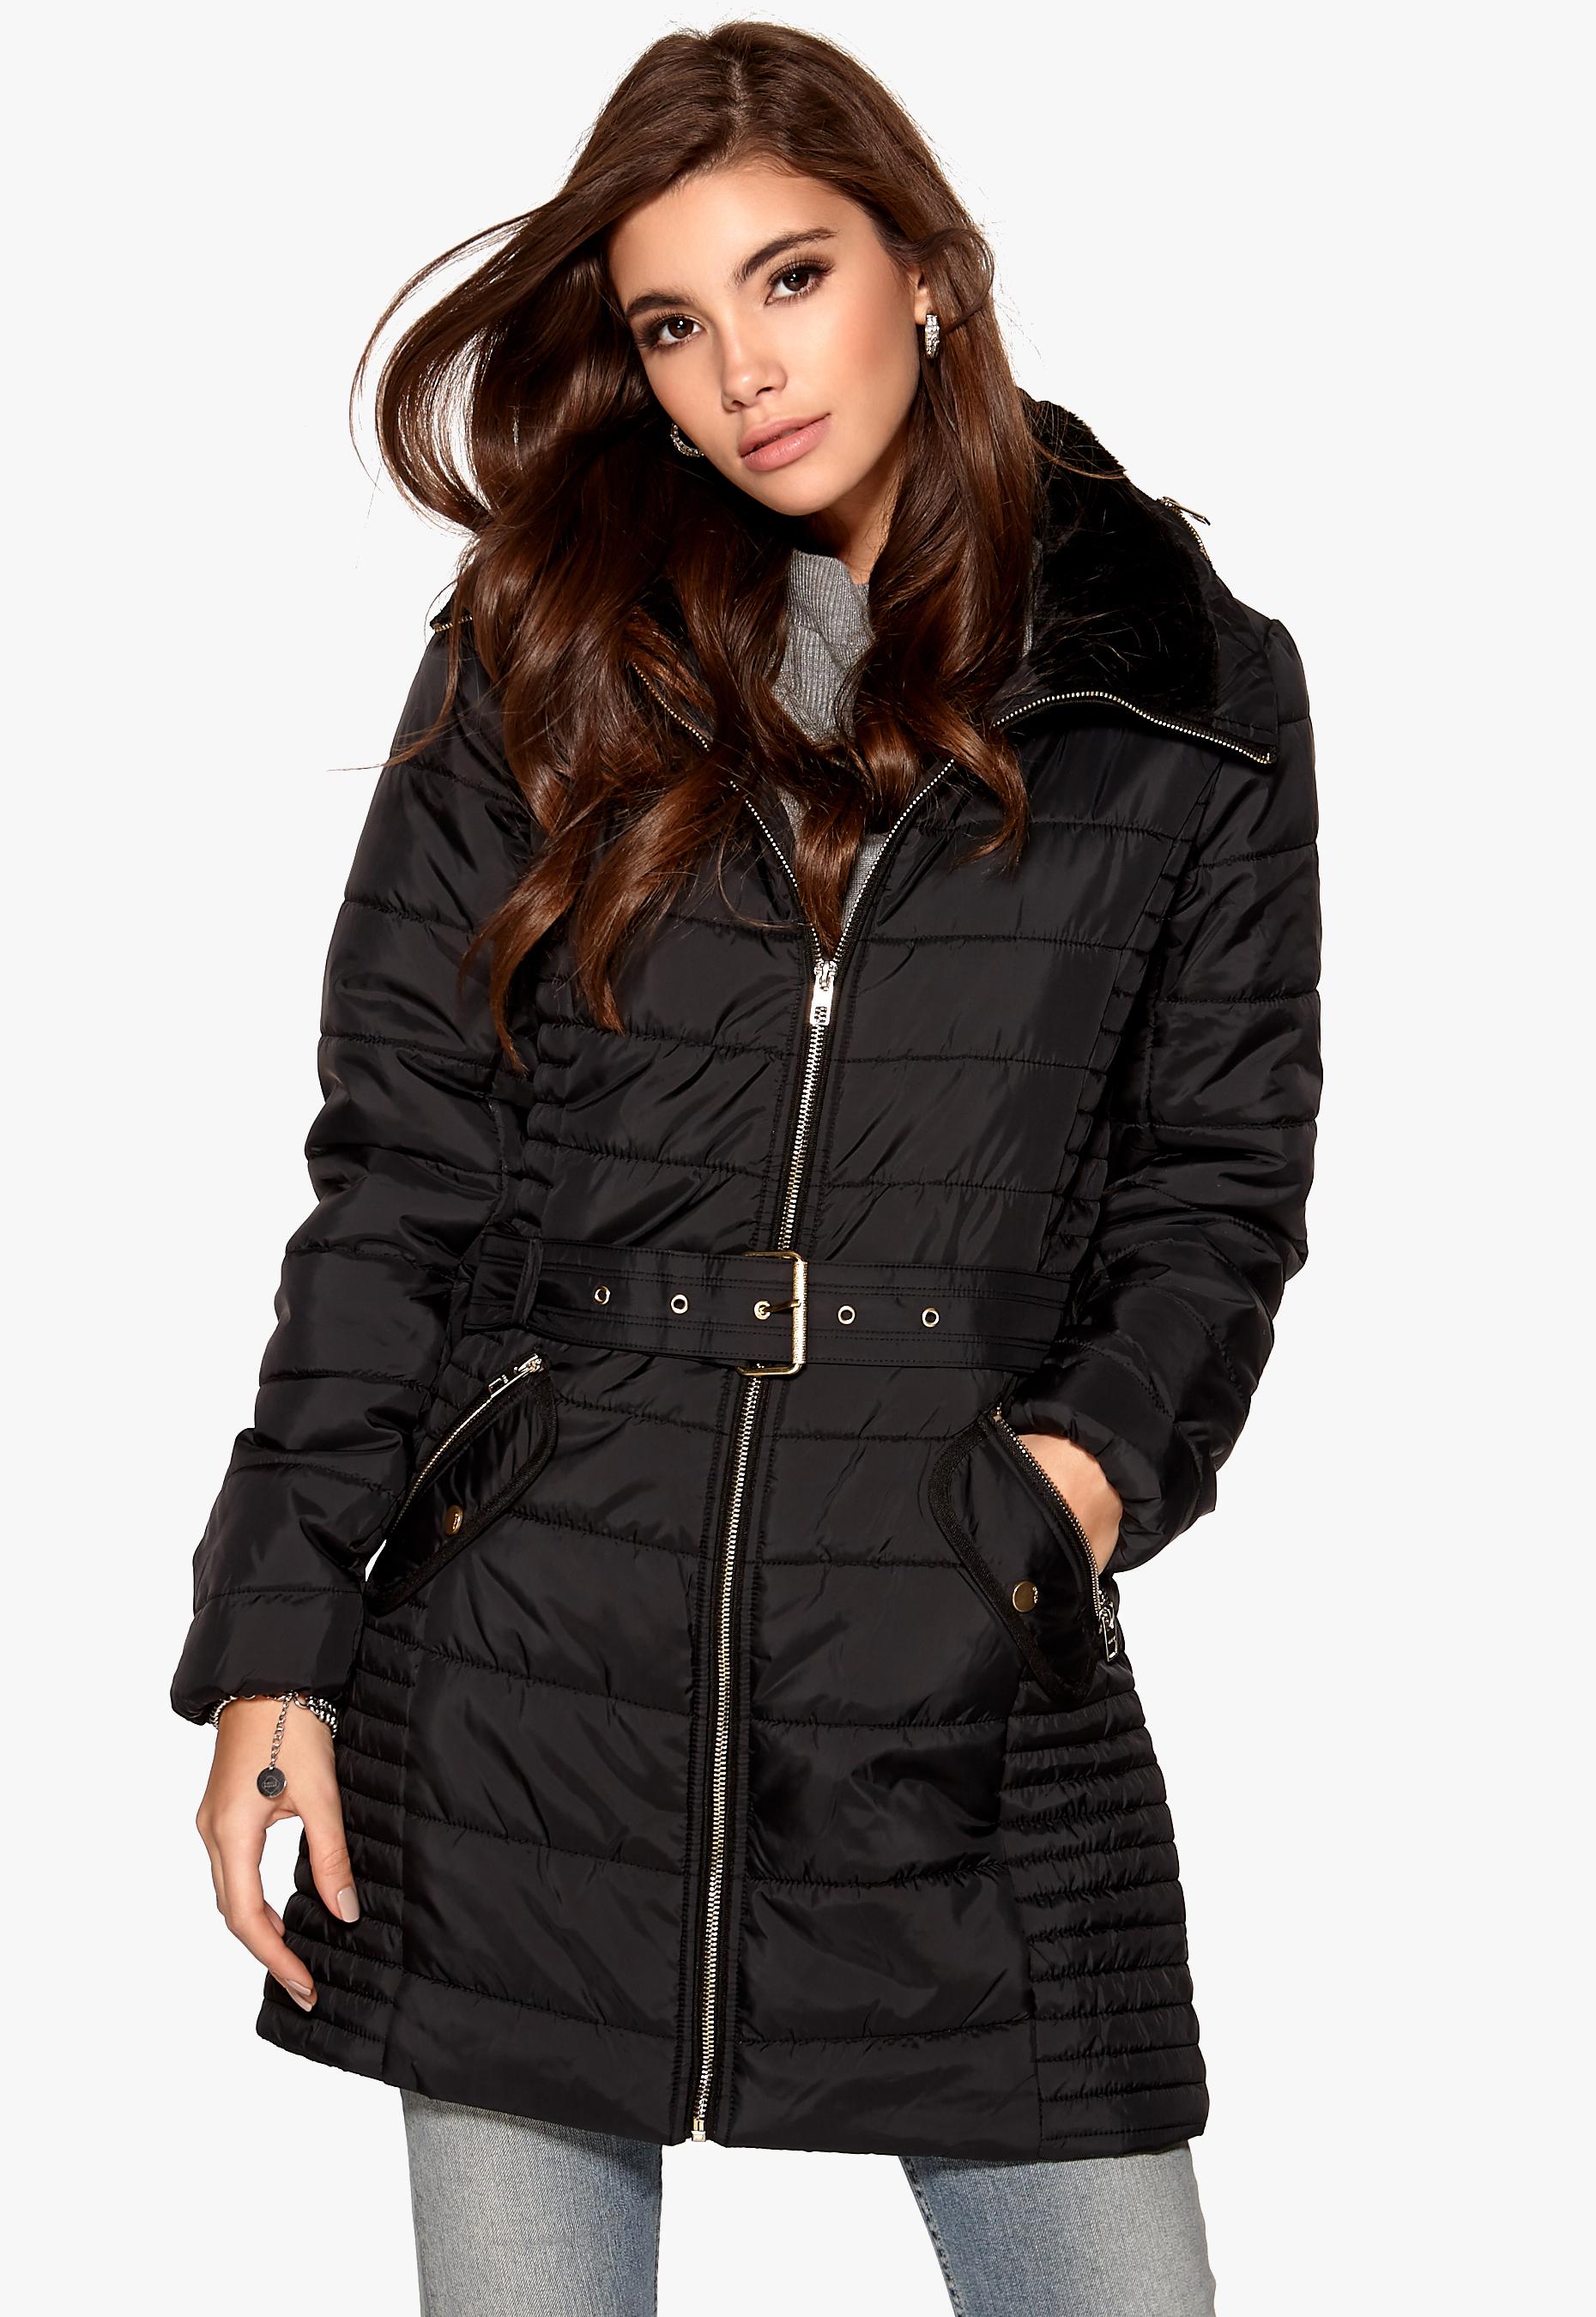 Black Nylon Coat 96